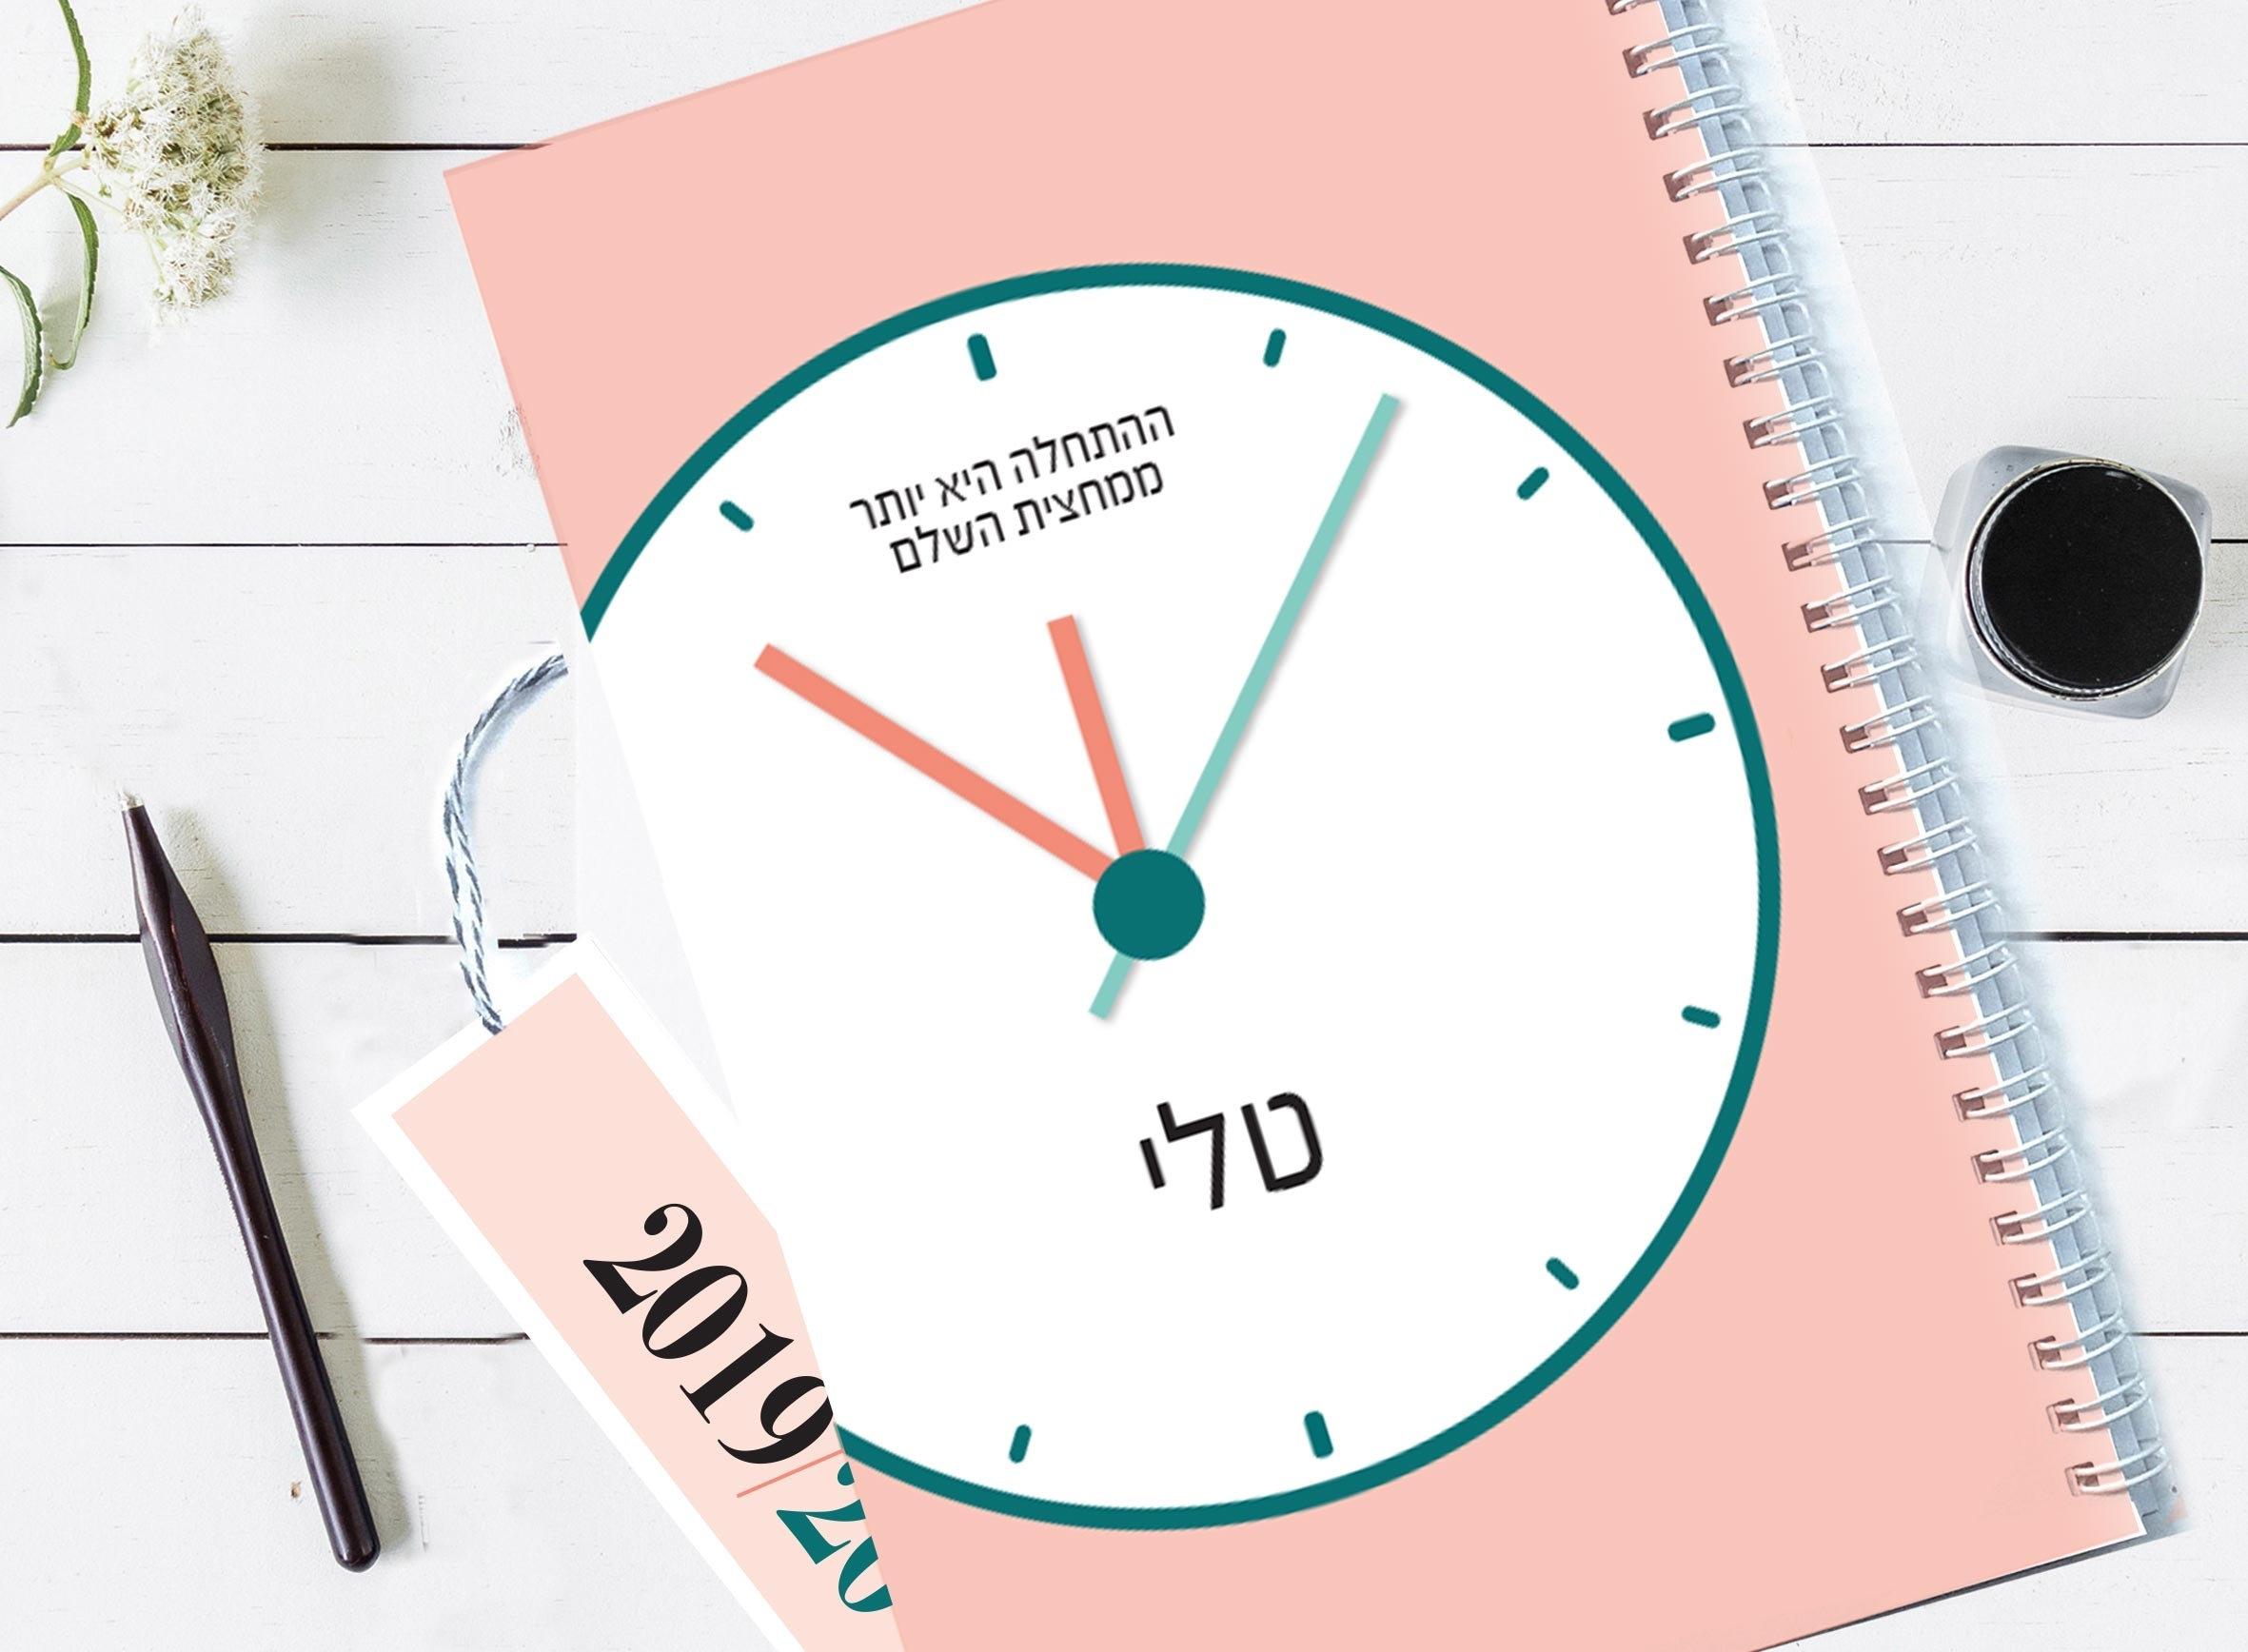 Personal Hebrew Weekly Calendar 2019-20 Creative Calendar | Etsy regarding Weekly Torah Parsha Calendar For 2019/2020